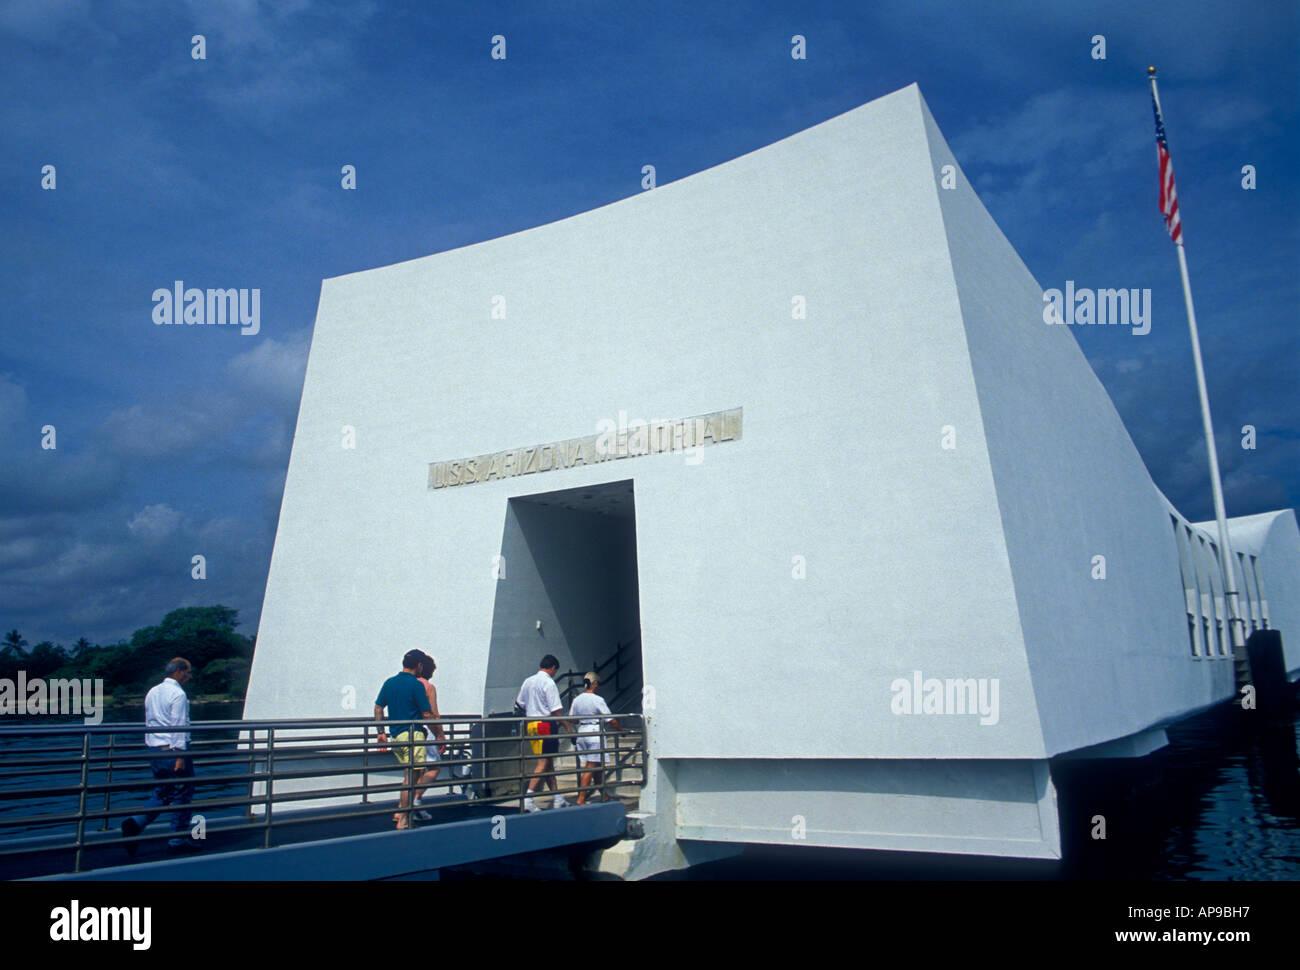 tourists, visitors, visiting, USS Arizona Memorial, Pearl Harbor, city of Honolulu, Honolulu, Oahu, Oahu Island, Stock Photo